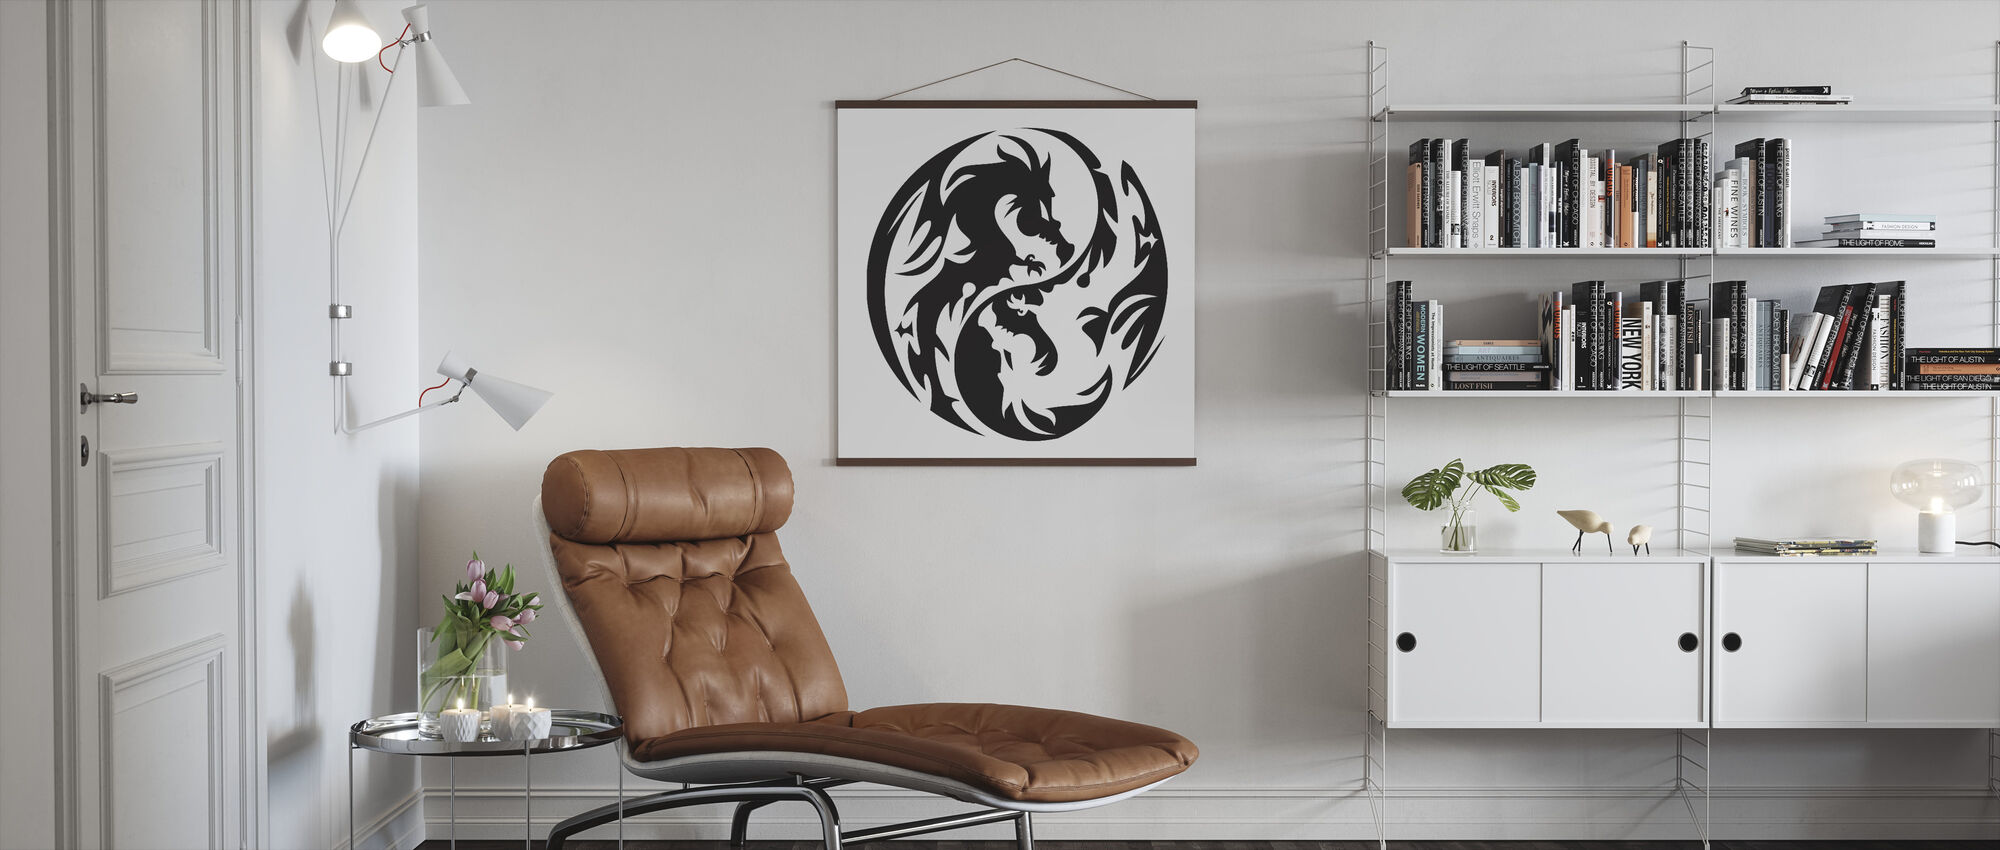 Circle Dragons - Poster - Living Room